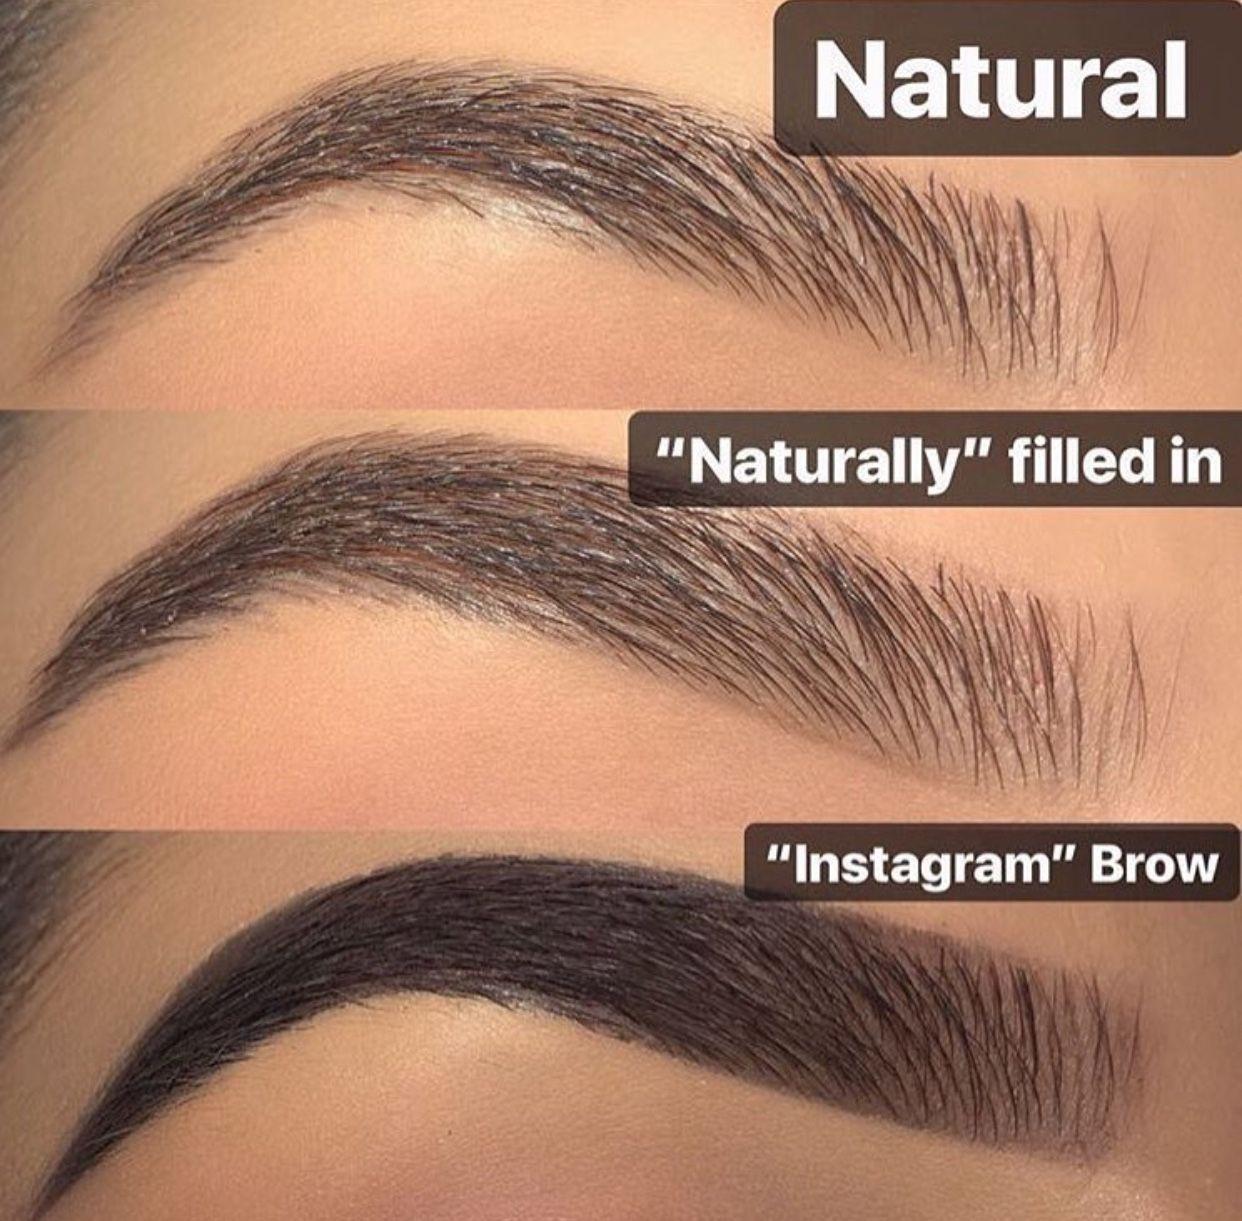 Natural Eyebrows Brow Tutorial Instagram Eyebrows Filled In